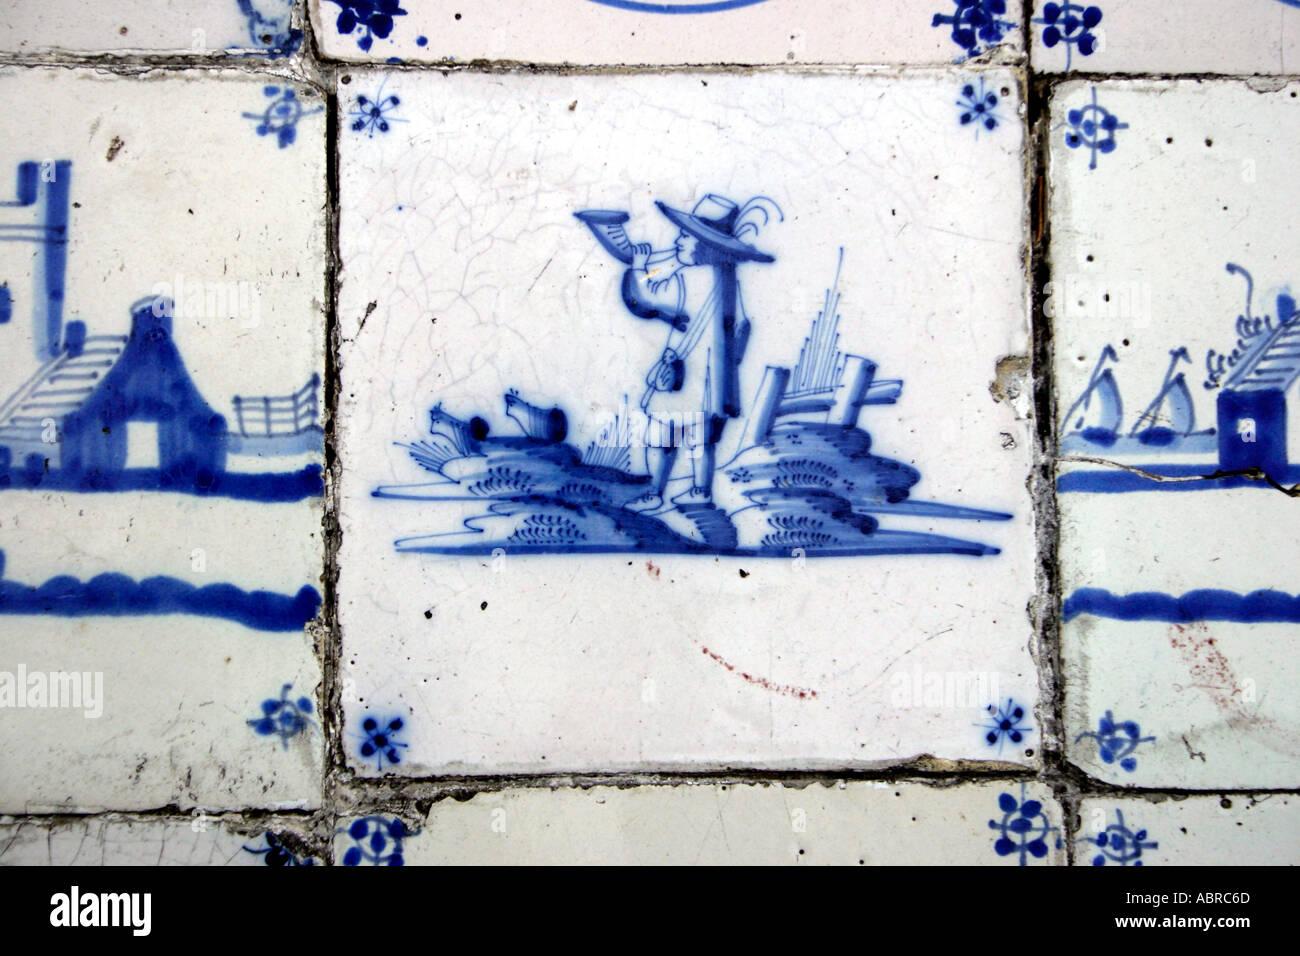 Eighteenth Nineteenth Century Delft Tile Hand Painted in Cobalt Blue Bugler Motif - Stock Image